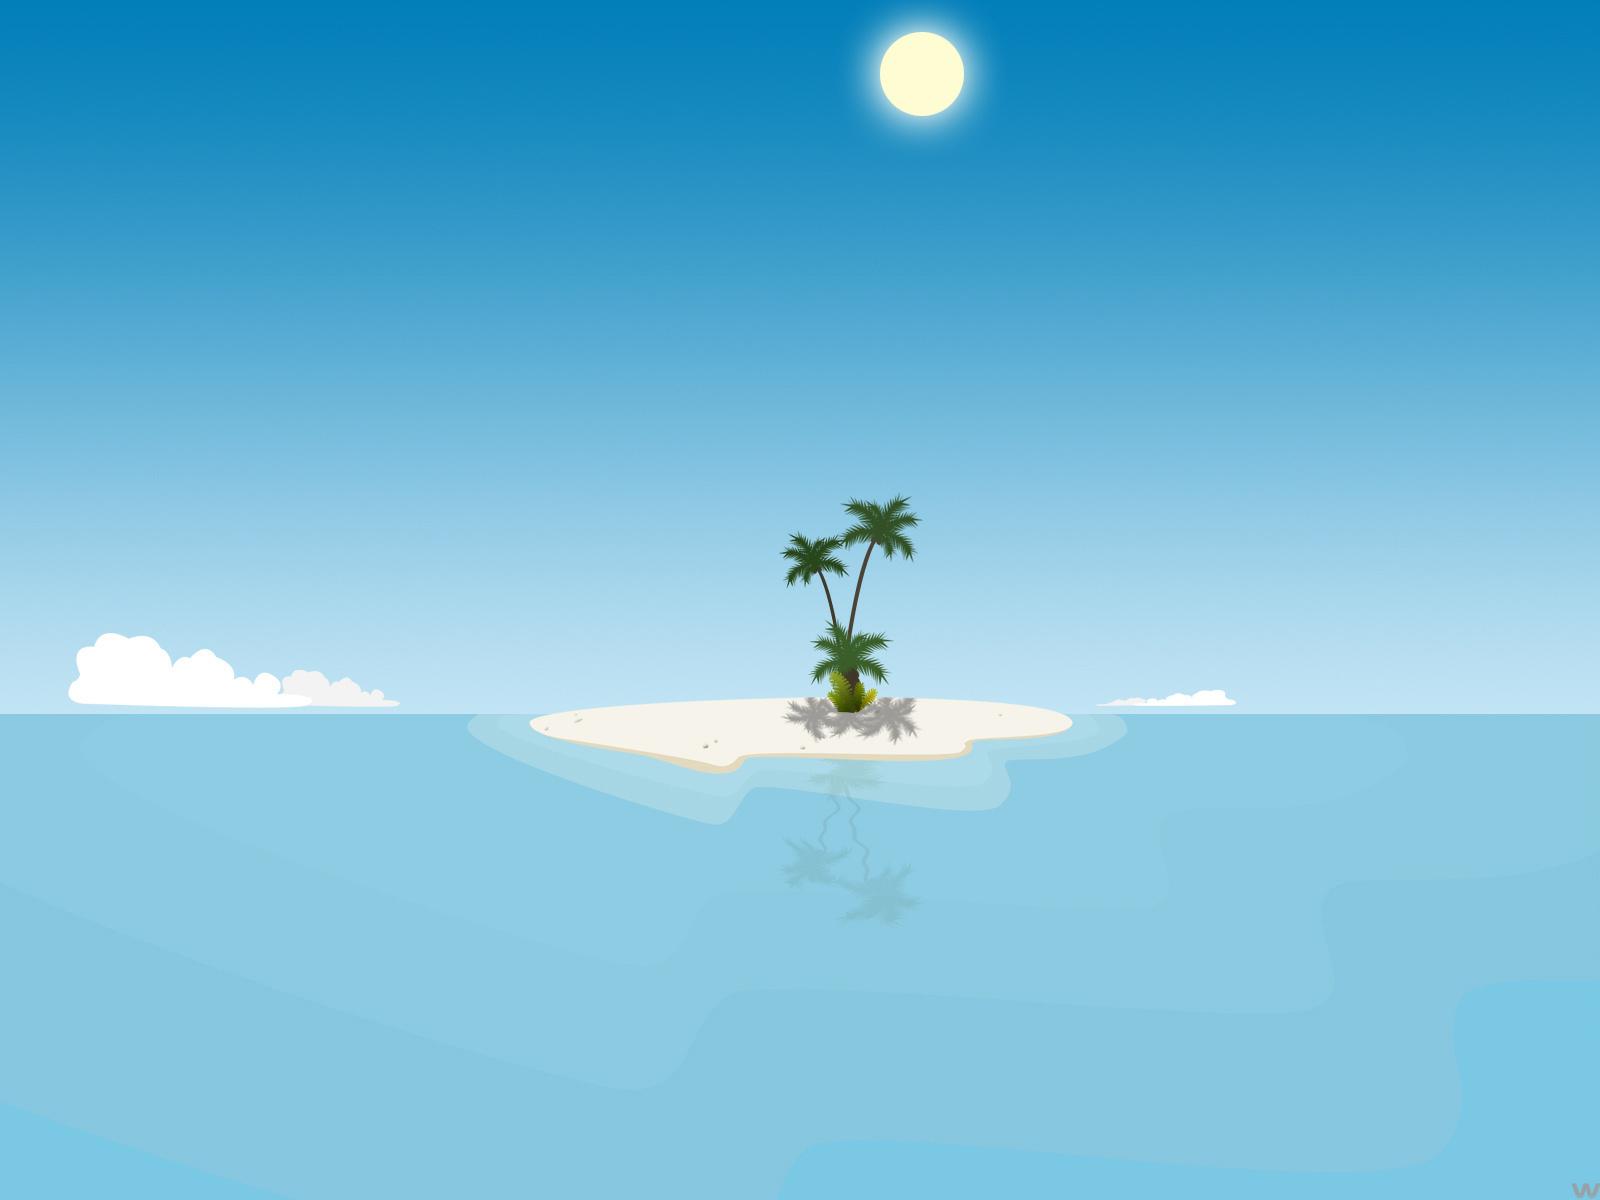 Blue Sea Travel Desktop Wallpapers Hd Wallpapers Pop 1600x1200